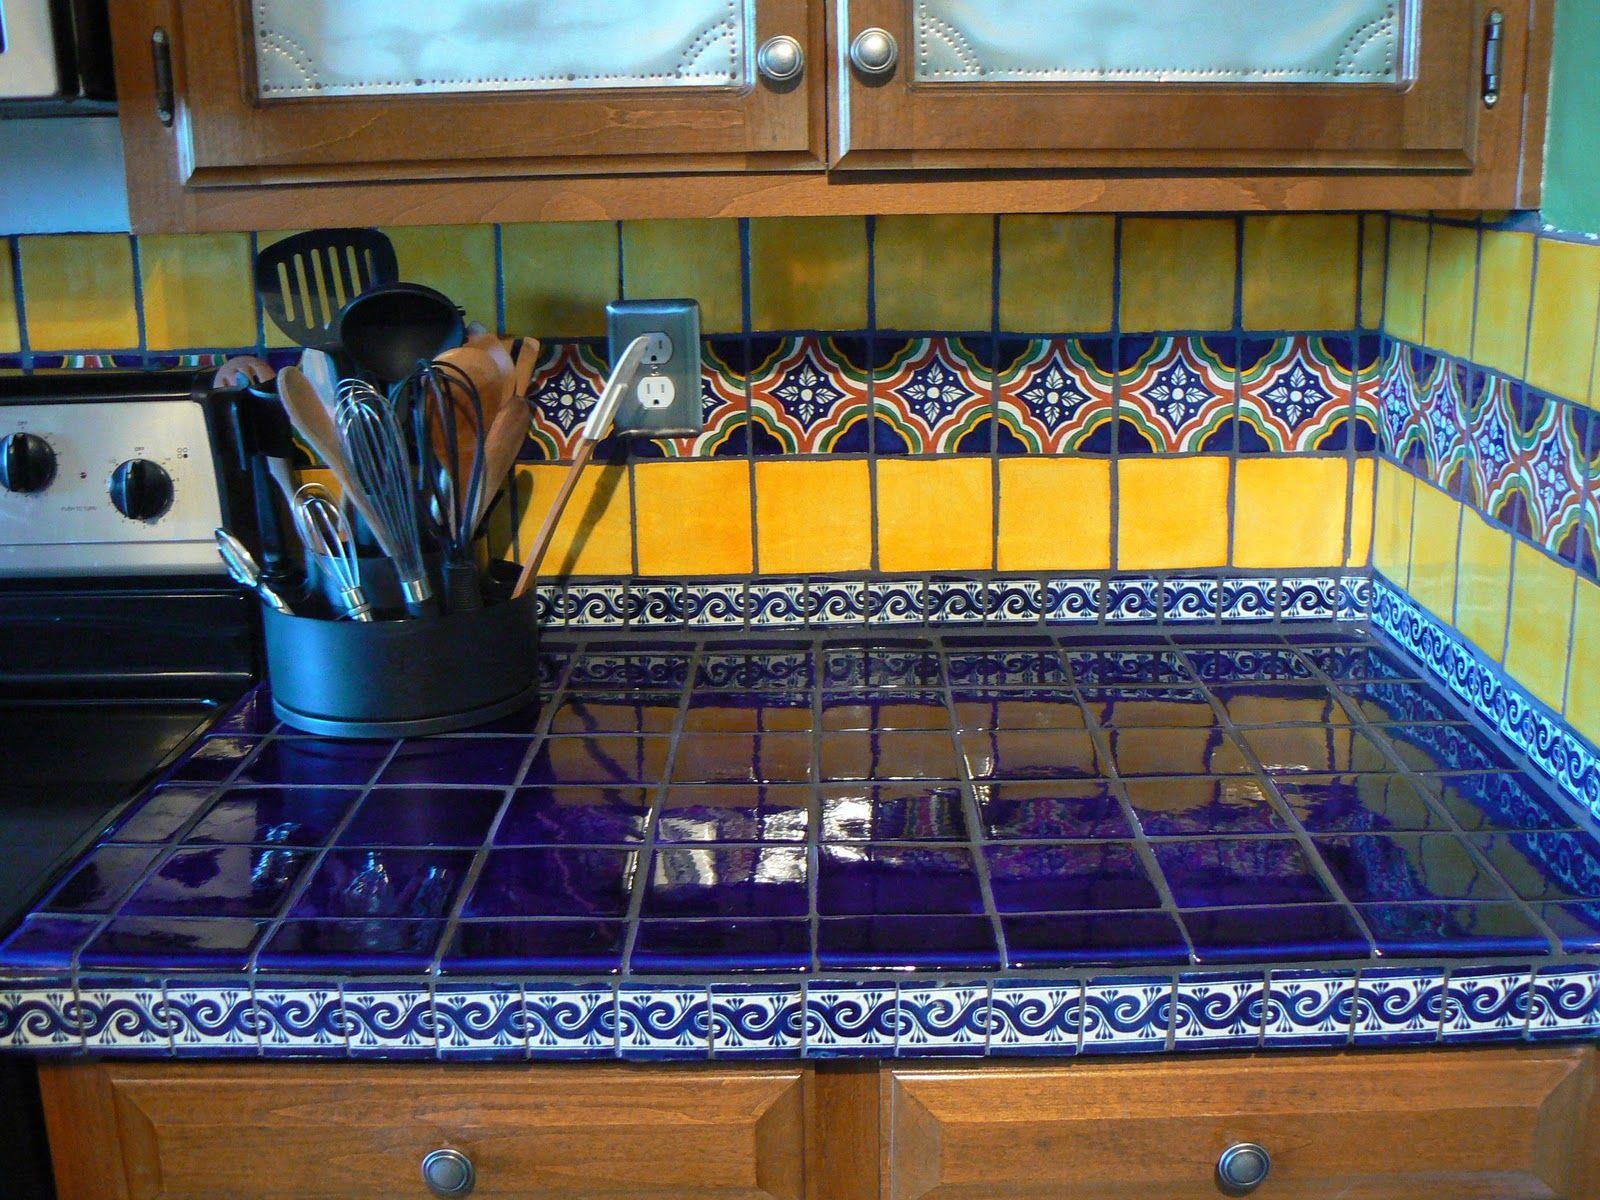 Cucine In Muratura épített Konyhák Mexican Style Kitchens Mexican Tile Kitchen Trendy Kitchen Tile